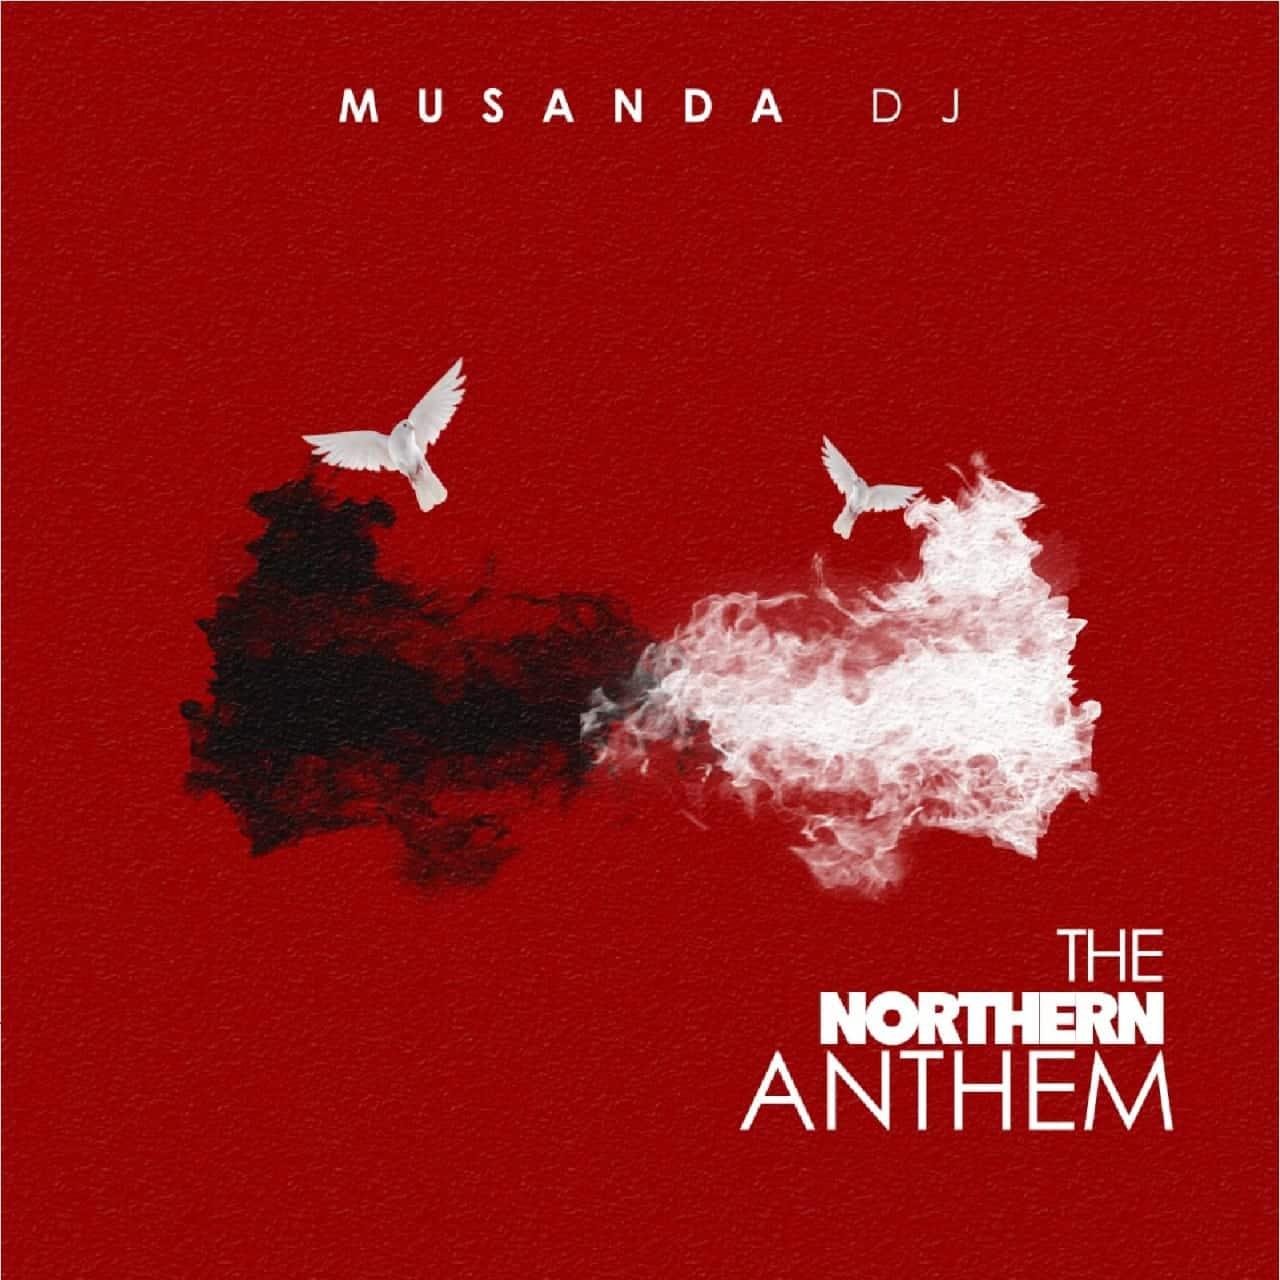 Musanda Dj - The Northern Anthem